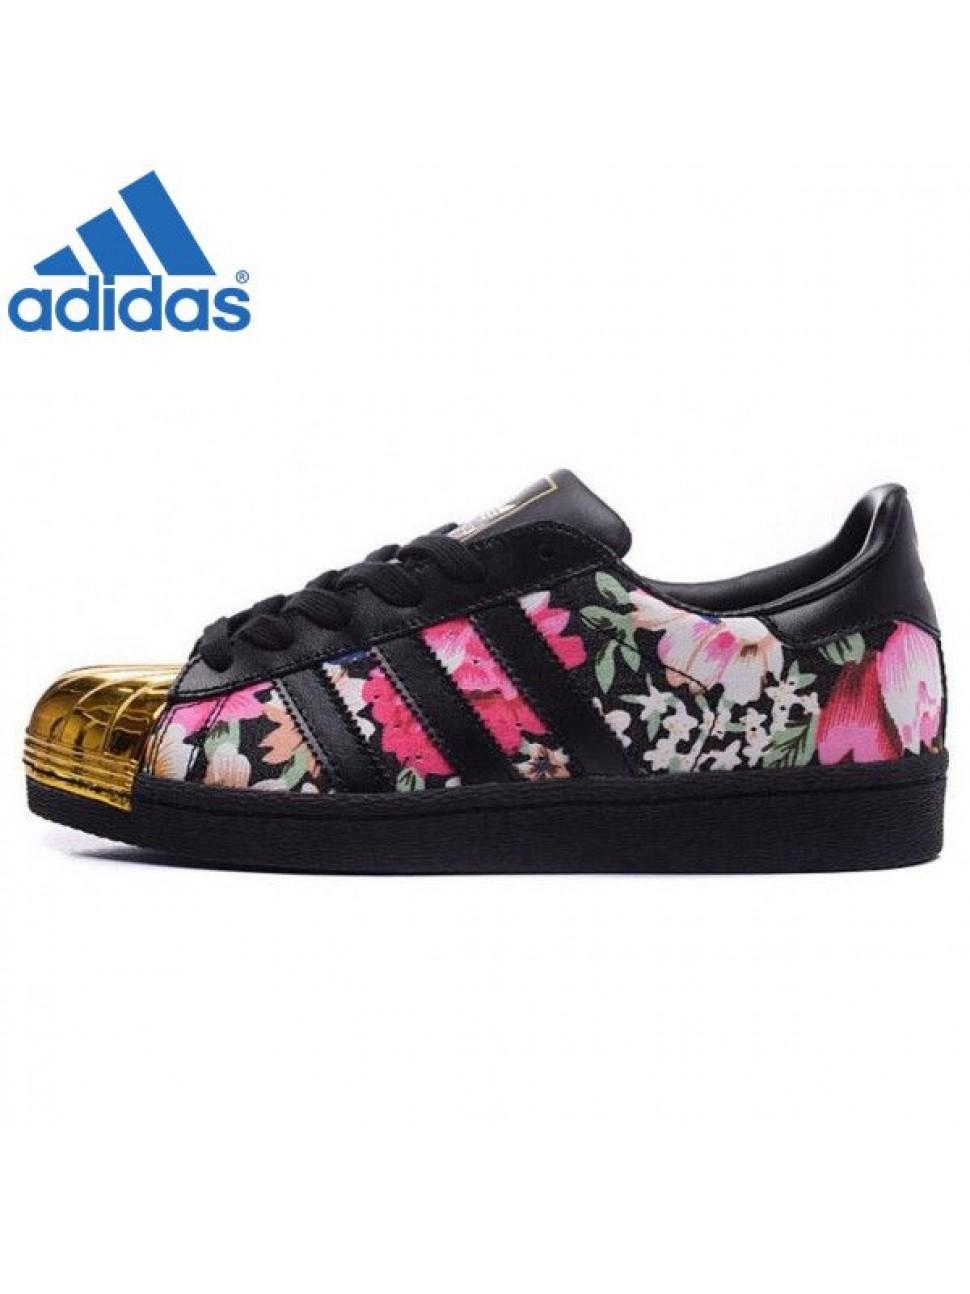 adidas superstar noir fleur